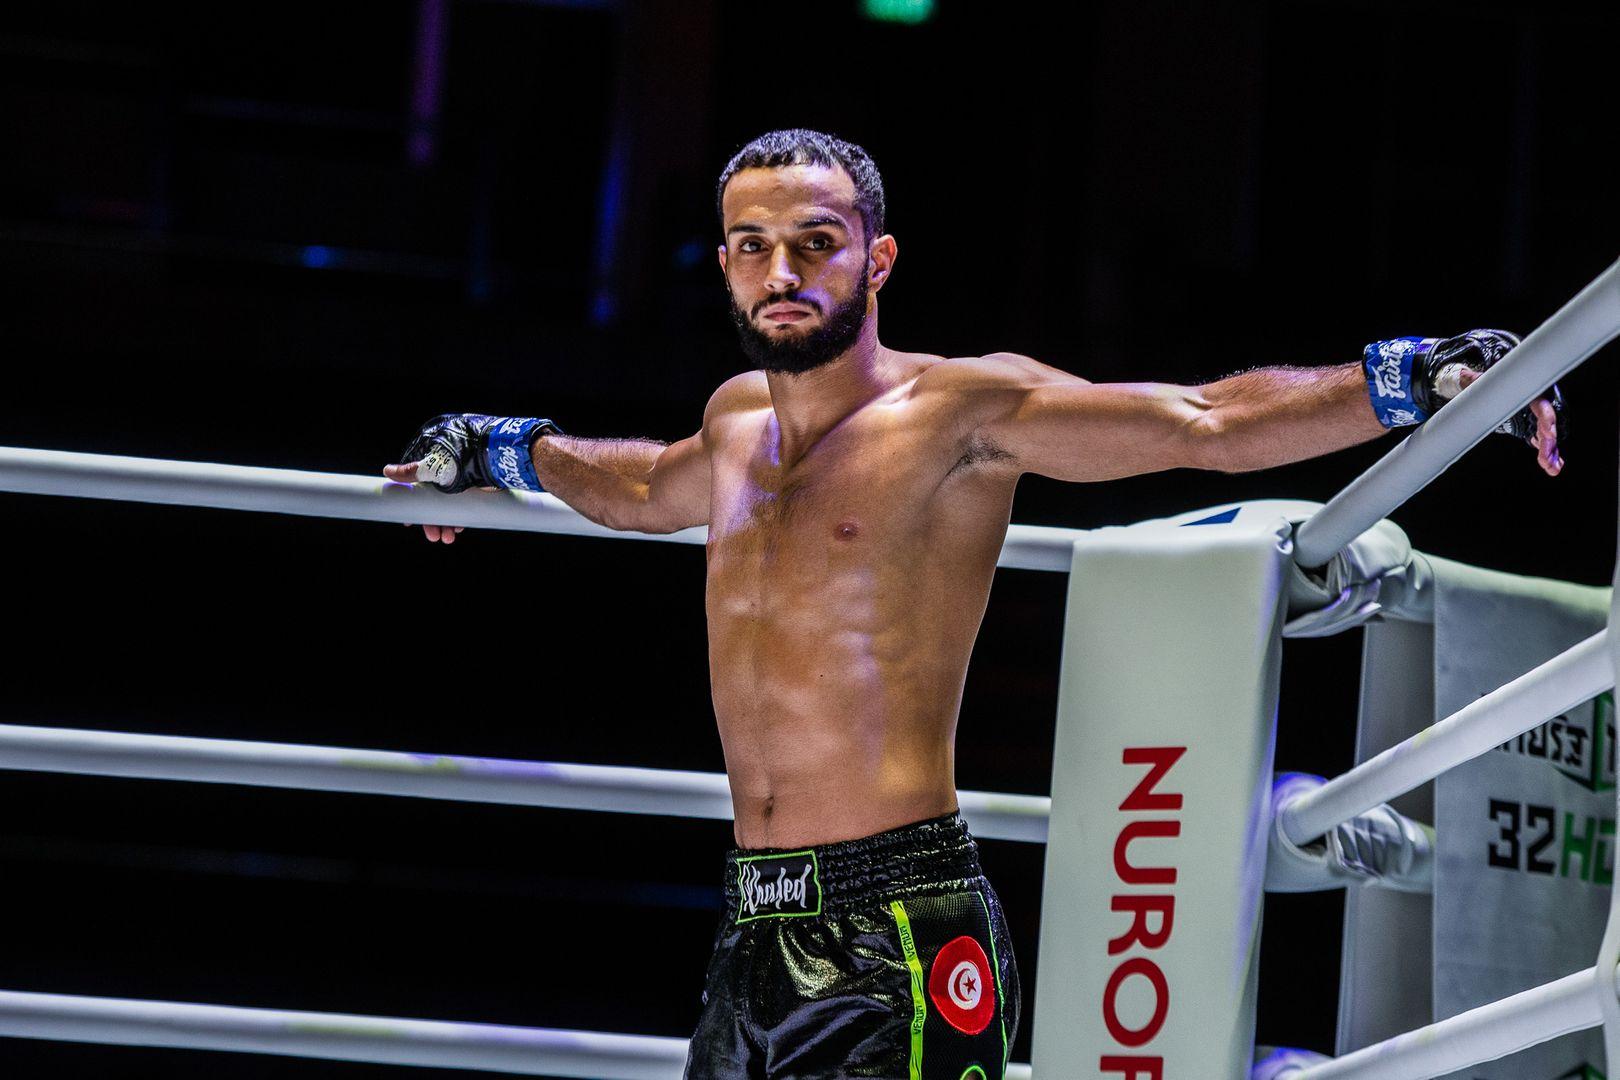 Tunisian Muay Thai fighter Fahdi Khaled